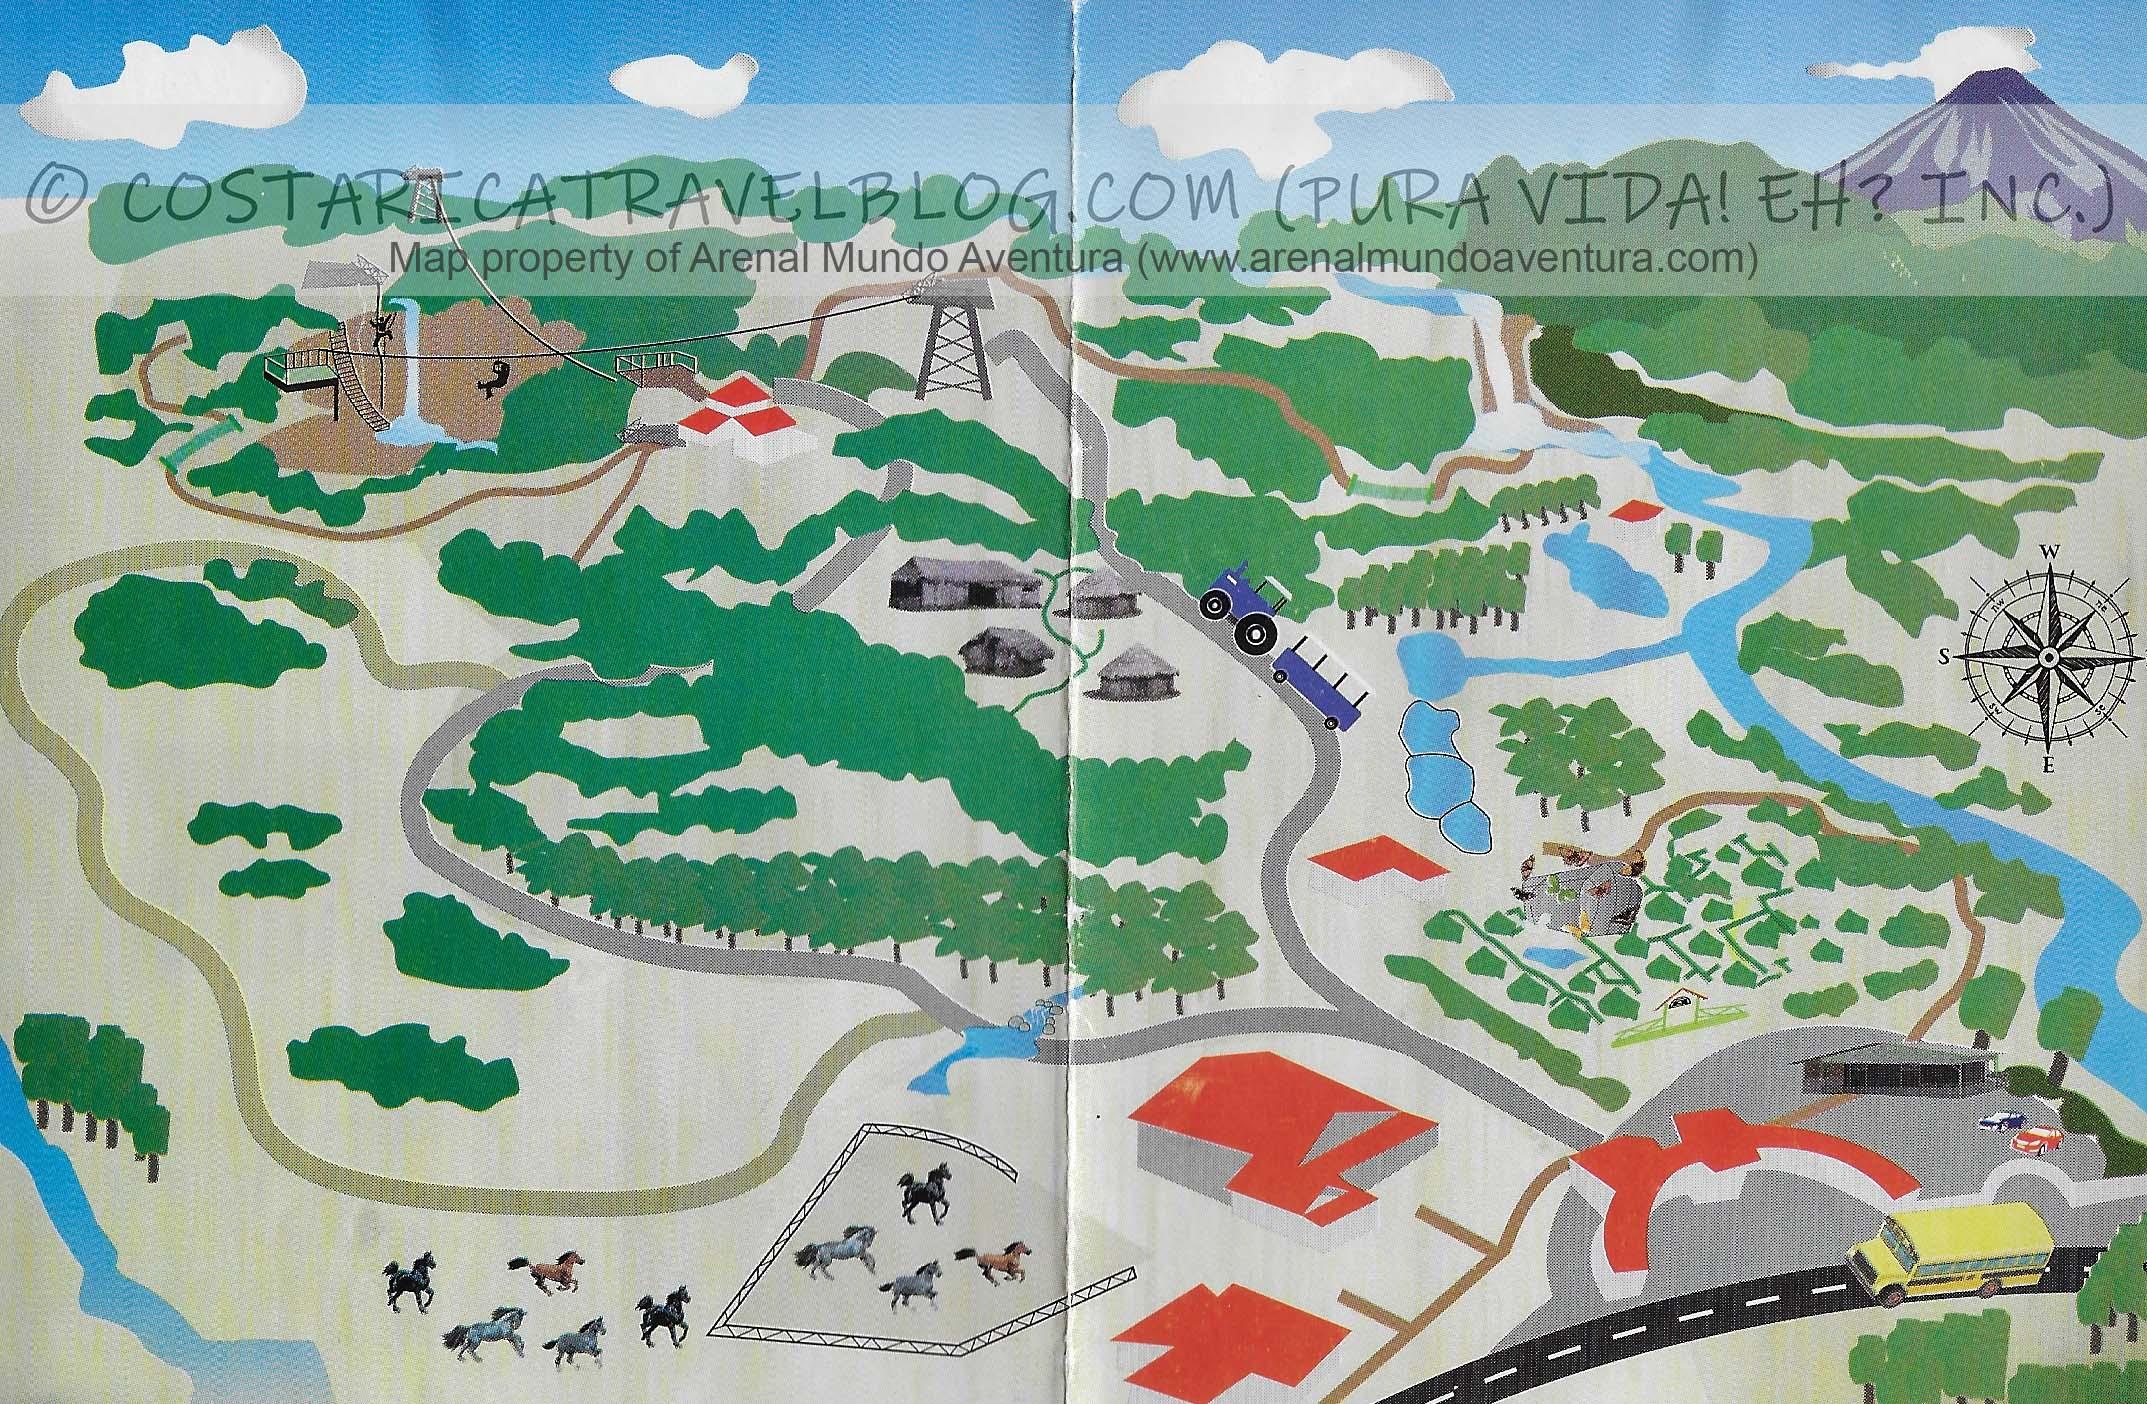 Arenal Mundo Aventura Ecological Park Map